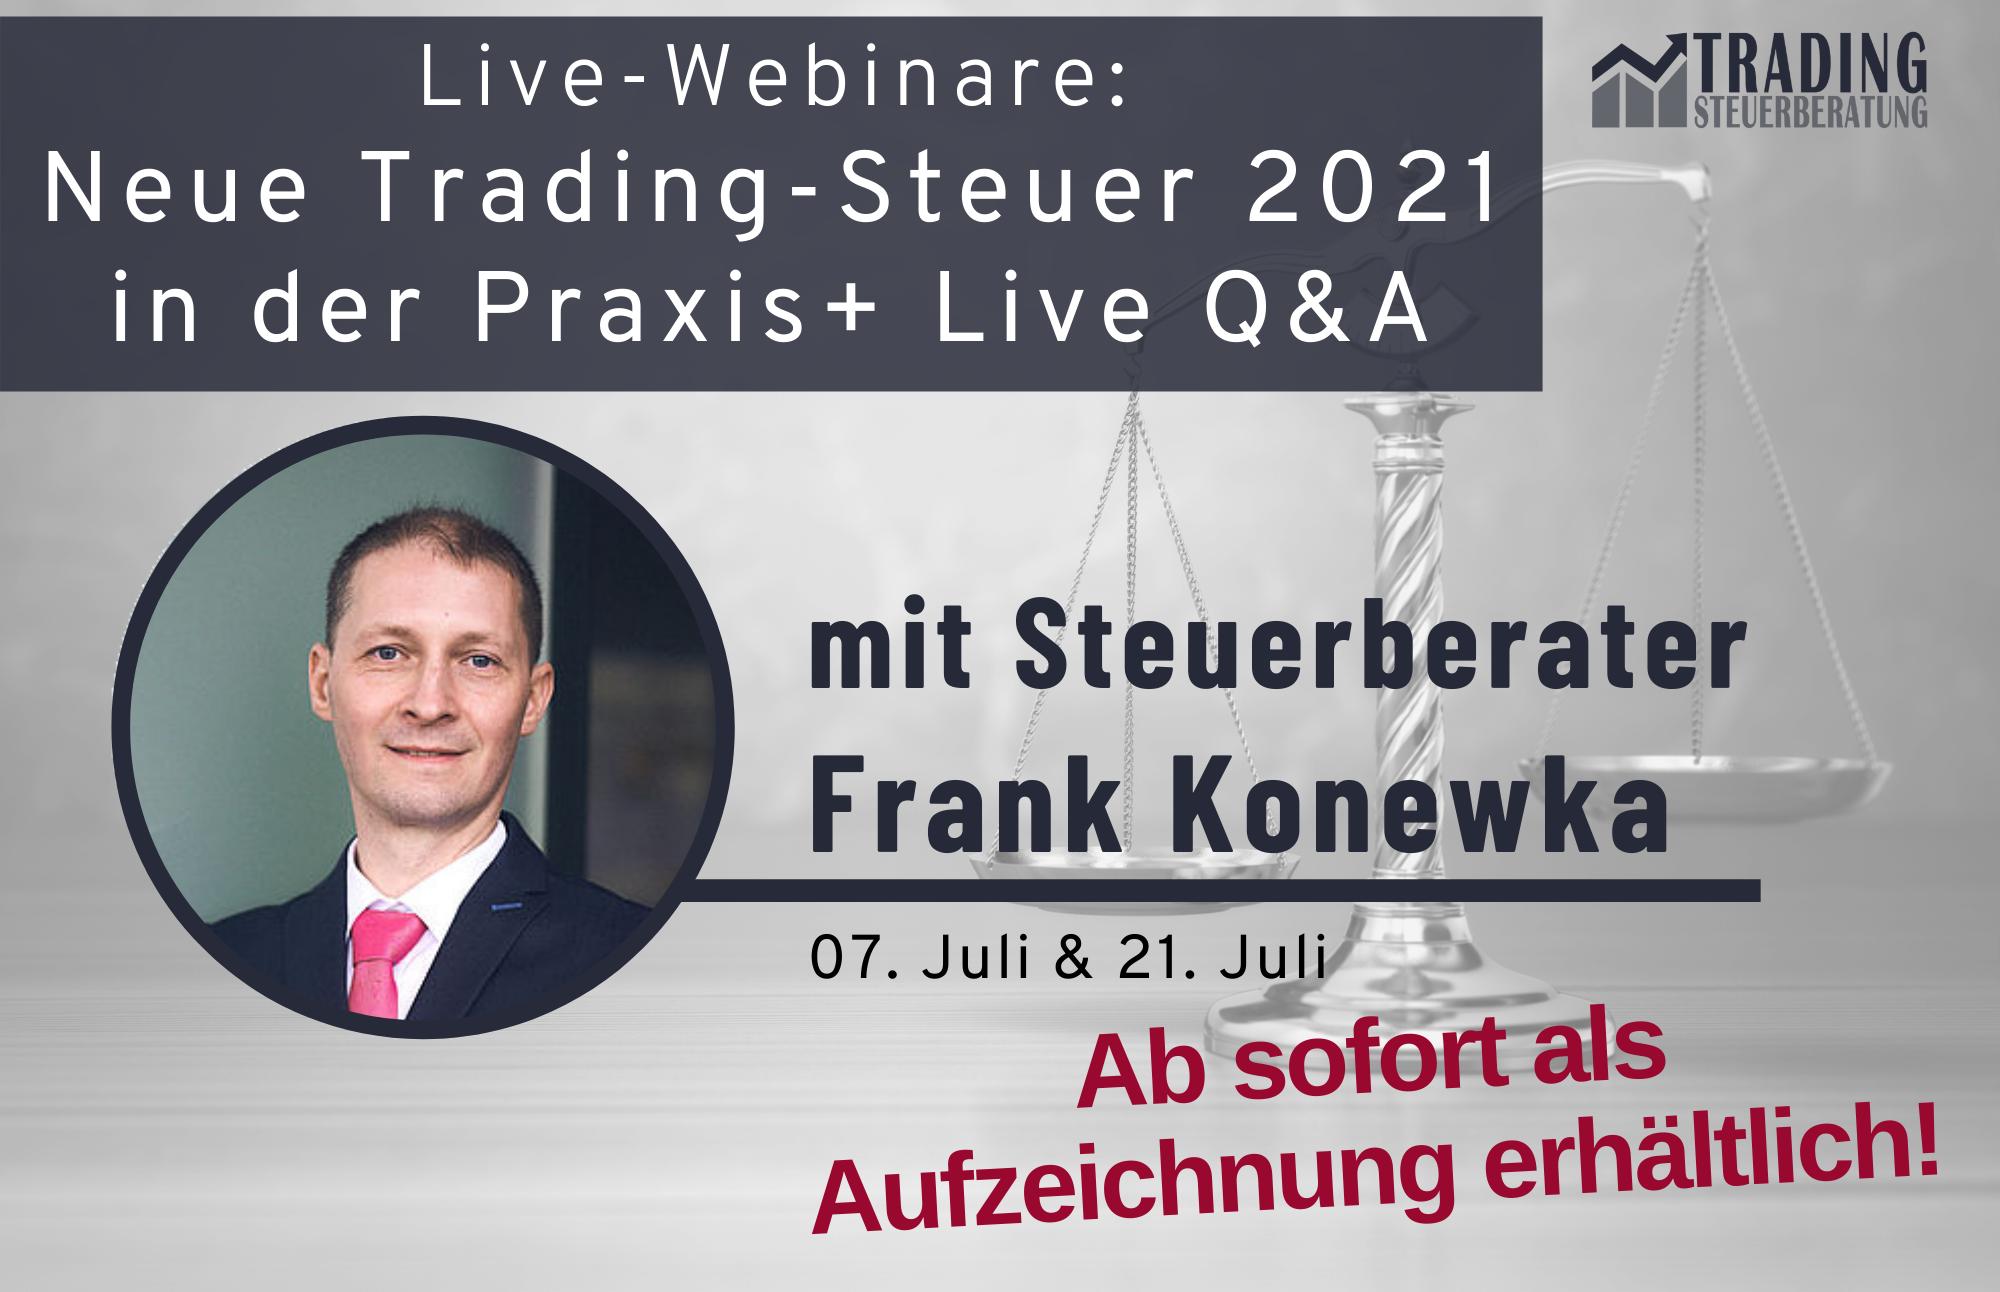 Live Webinare Trading Steuer 2021